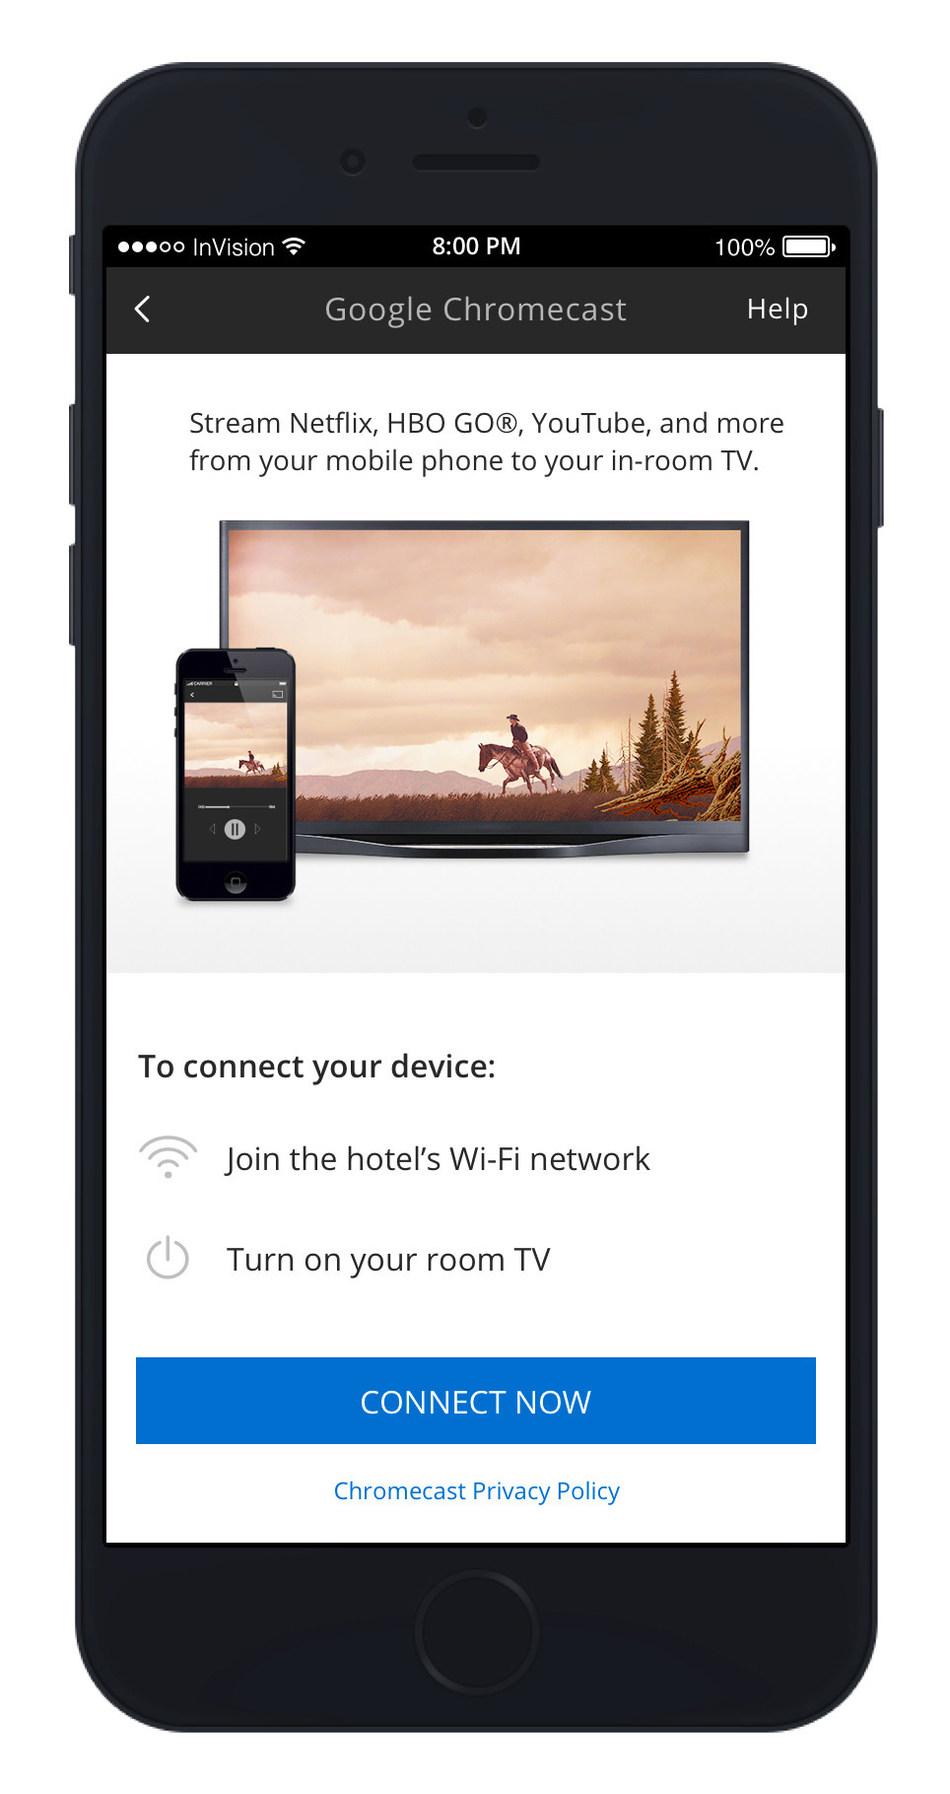 World of Hyatt app User Experience